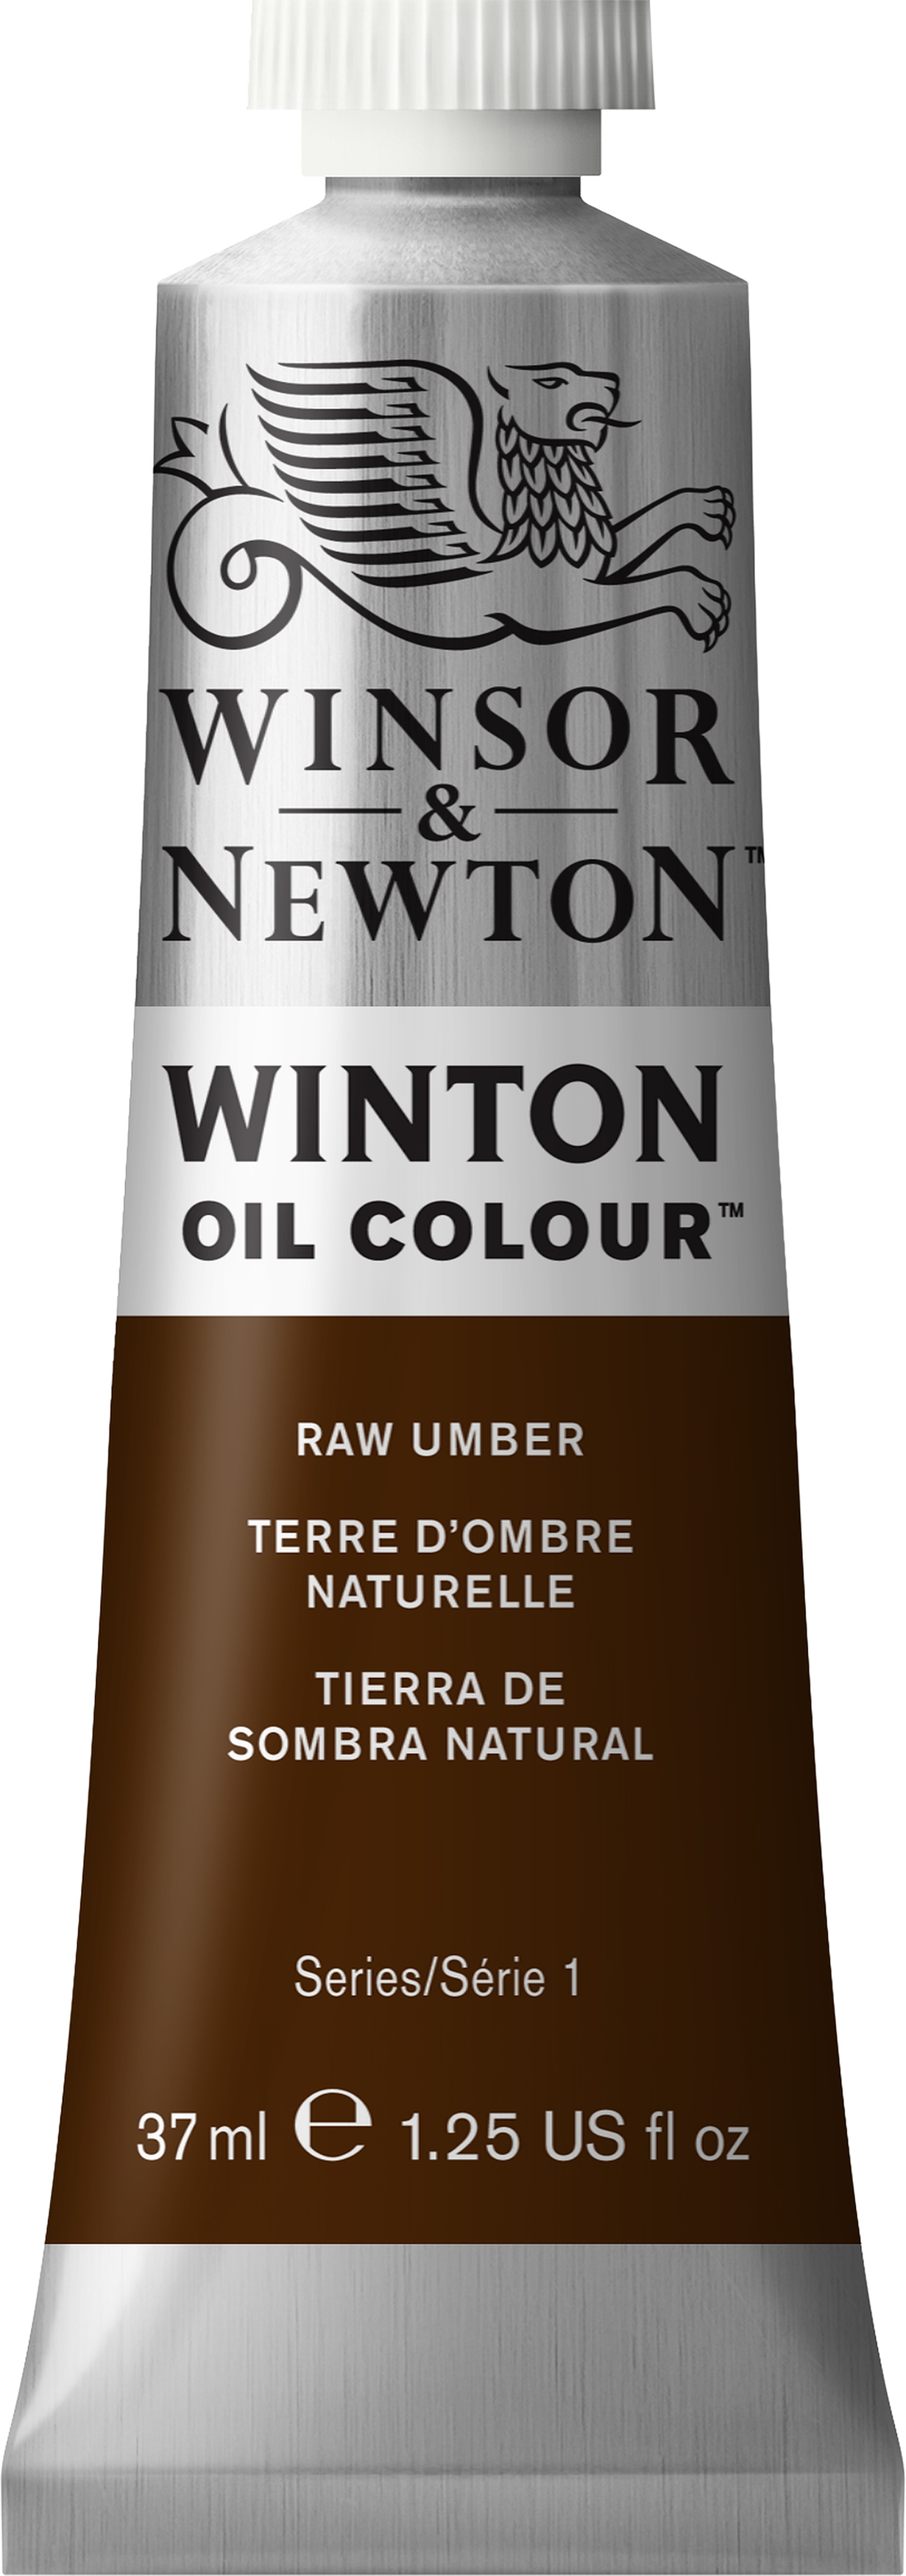 Winsor & Newton Winton Oil Colour 37ml-Raw Umber